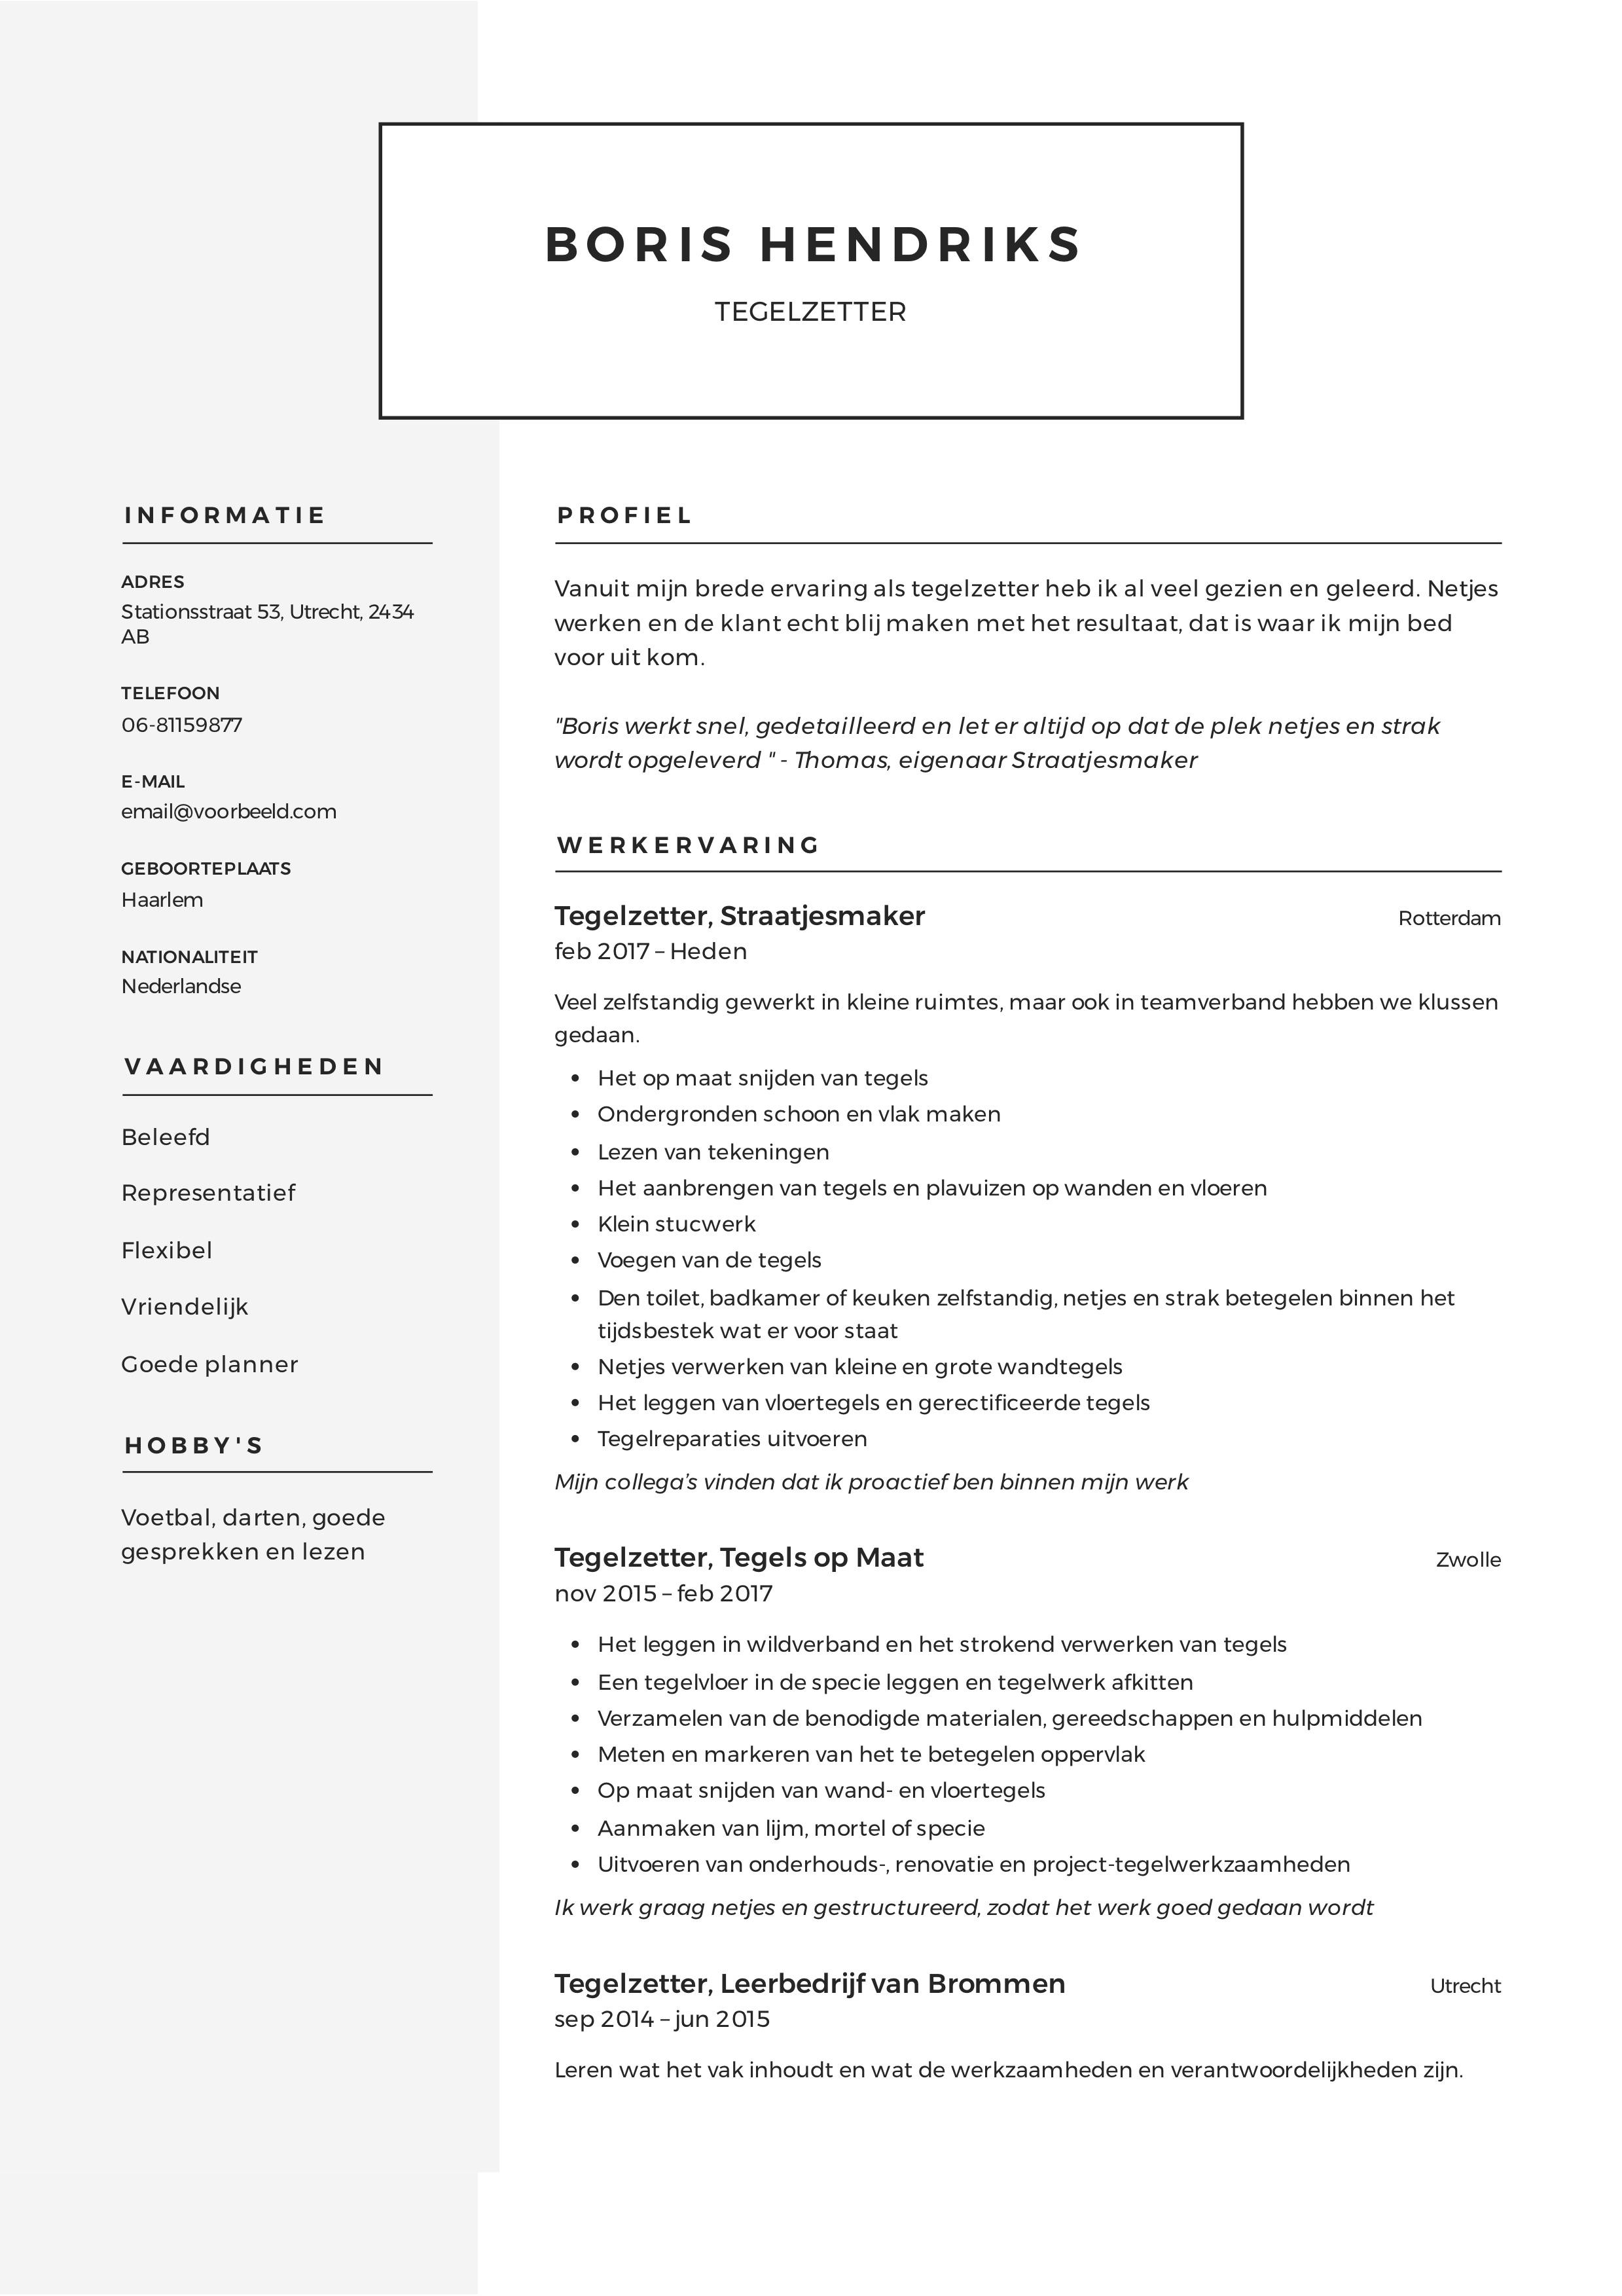 CV Tegelzetter